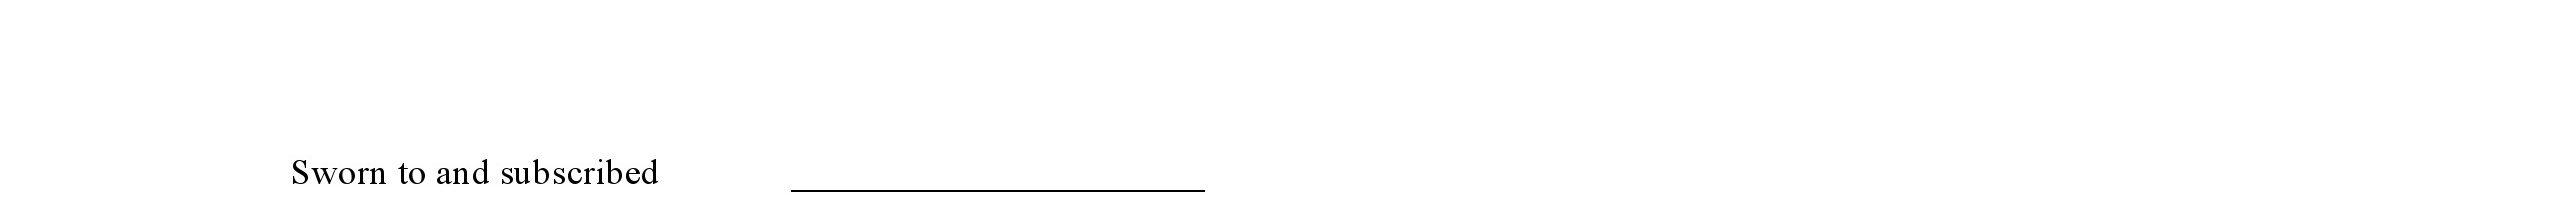 Free Affidavit Form PDF Word Do it Yourself Forms - blank affidavit